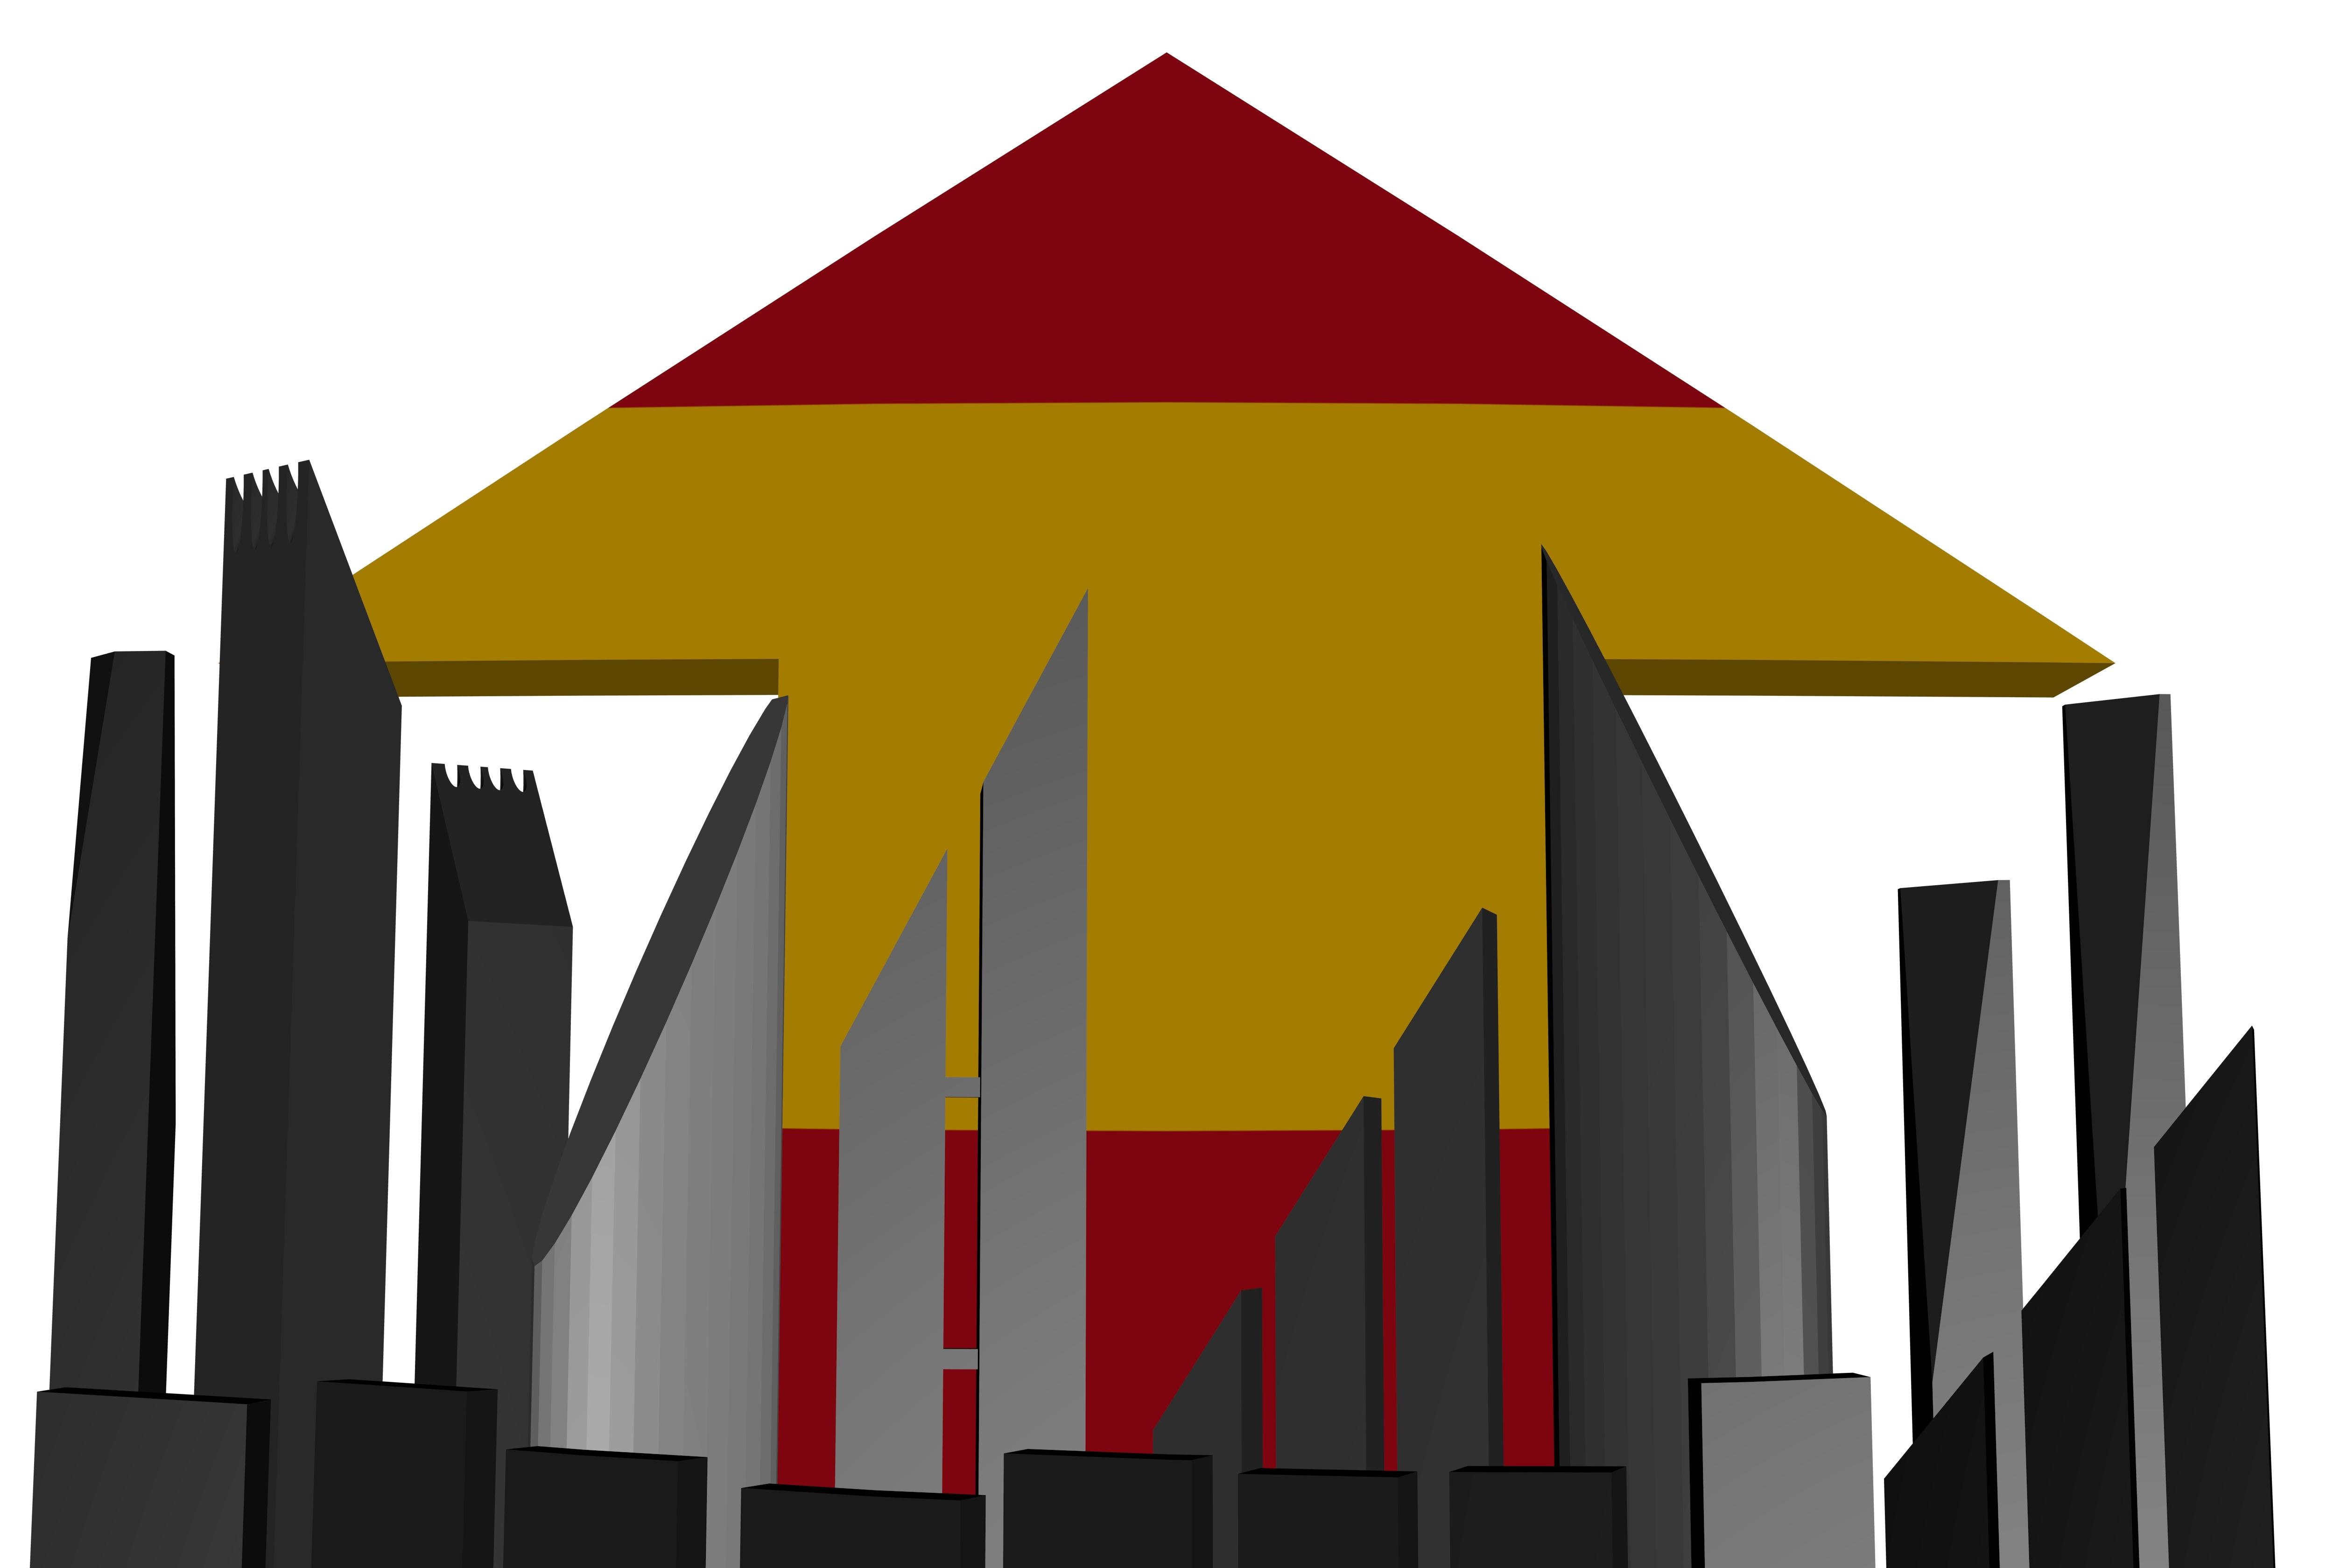 España se recupera de la crisis